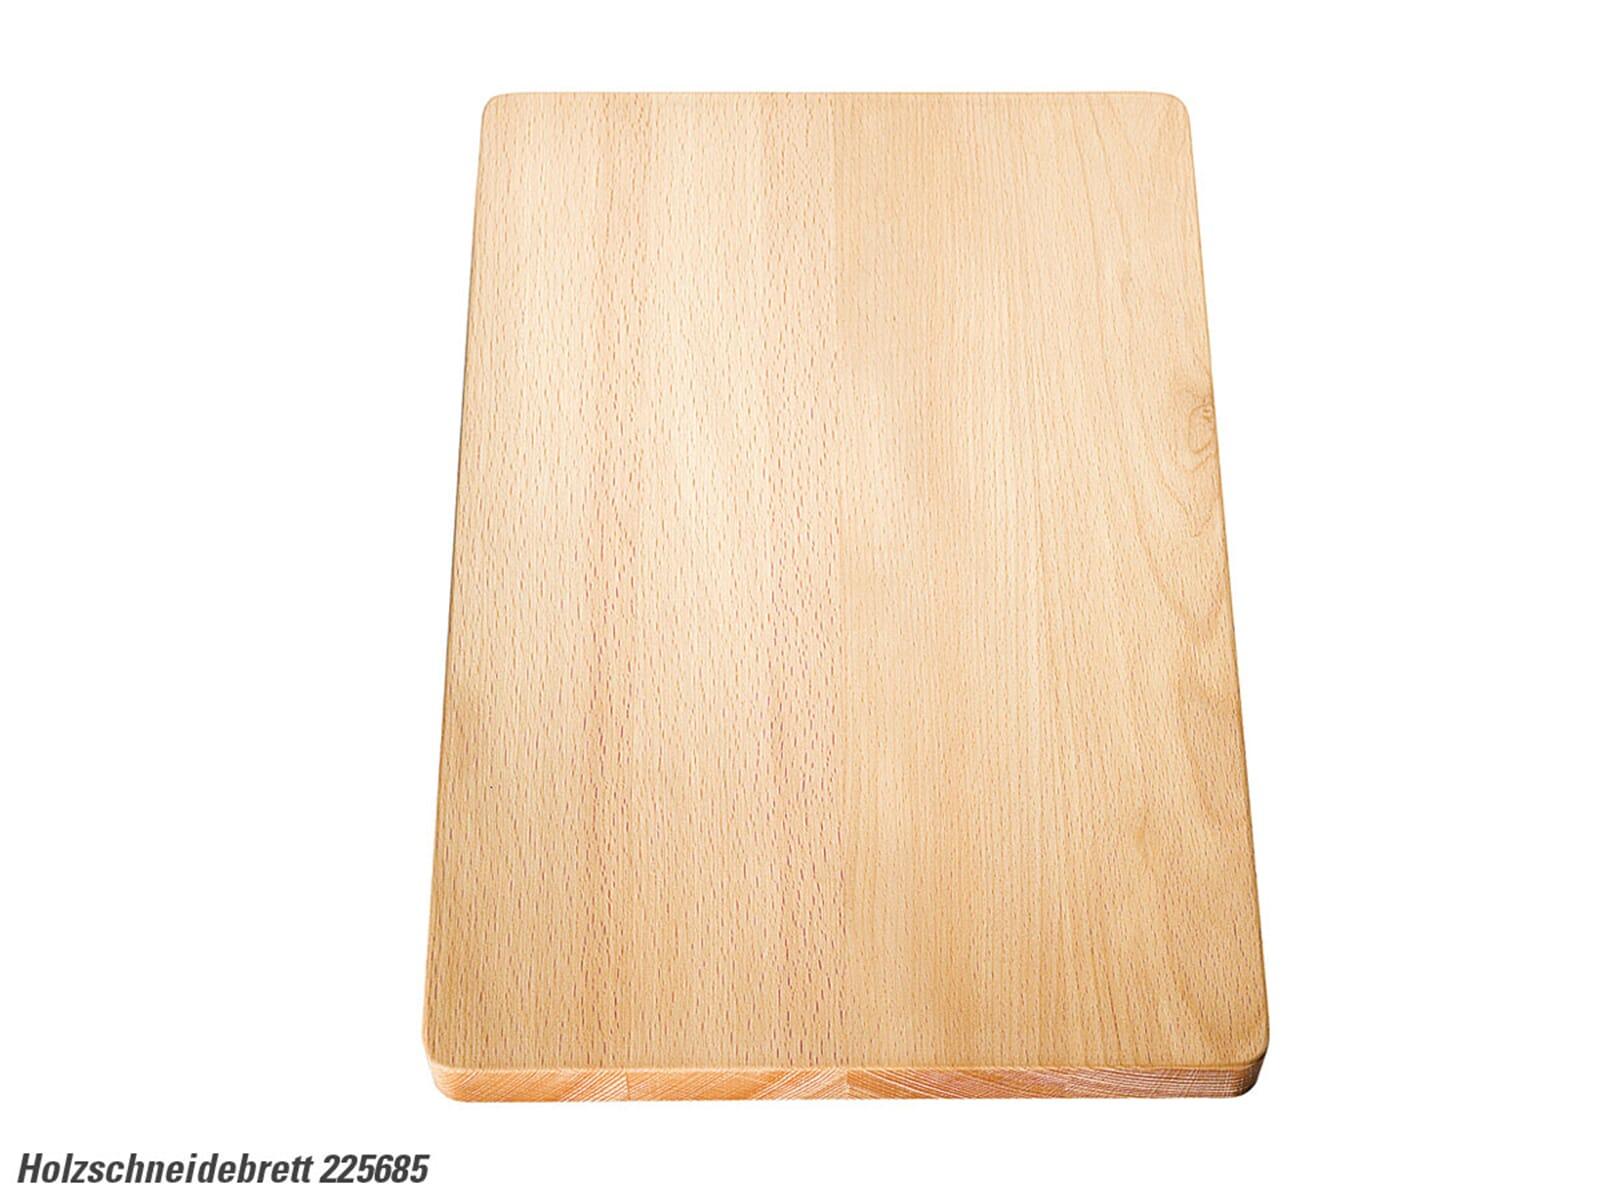 Blanco 225 685 Holzschneidebrett Buche